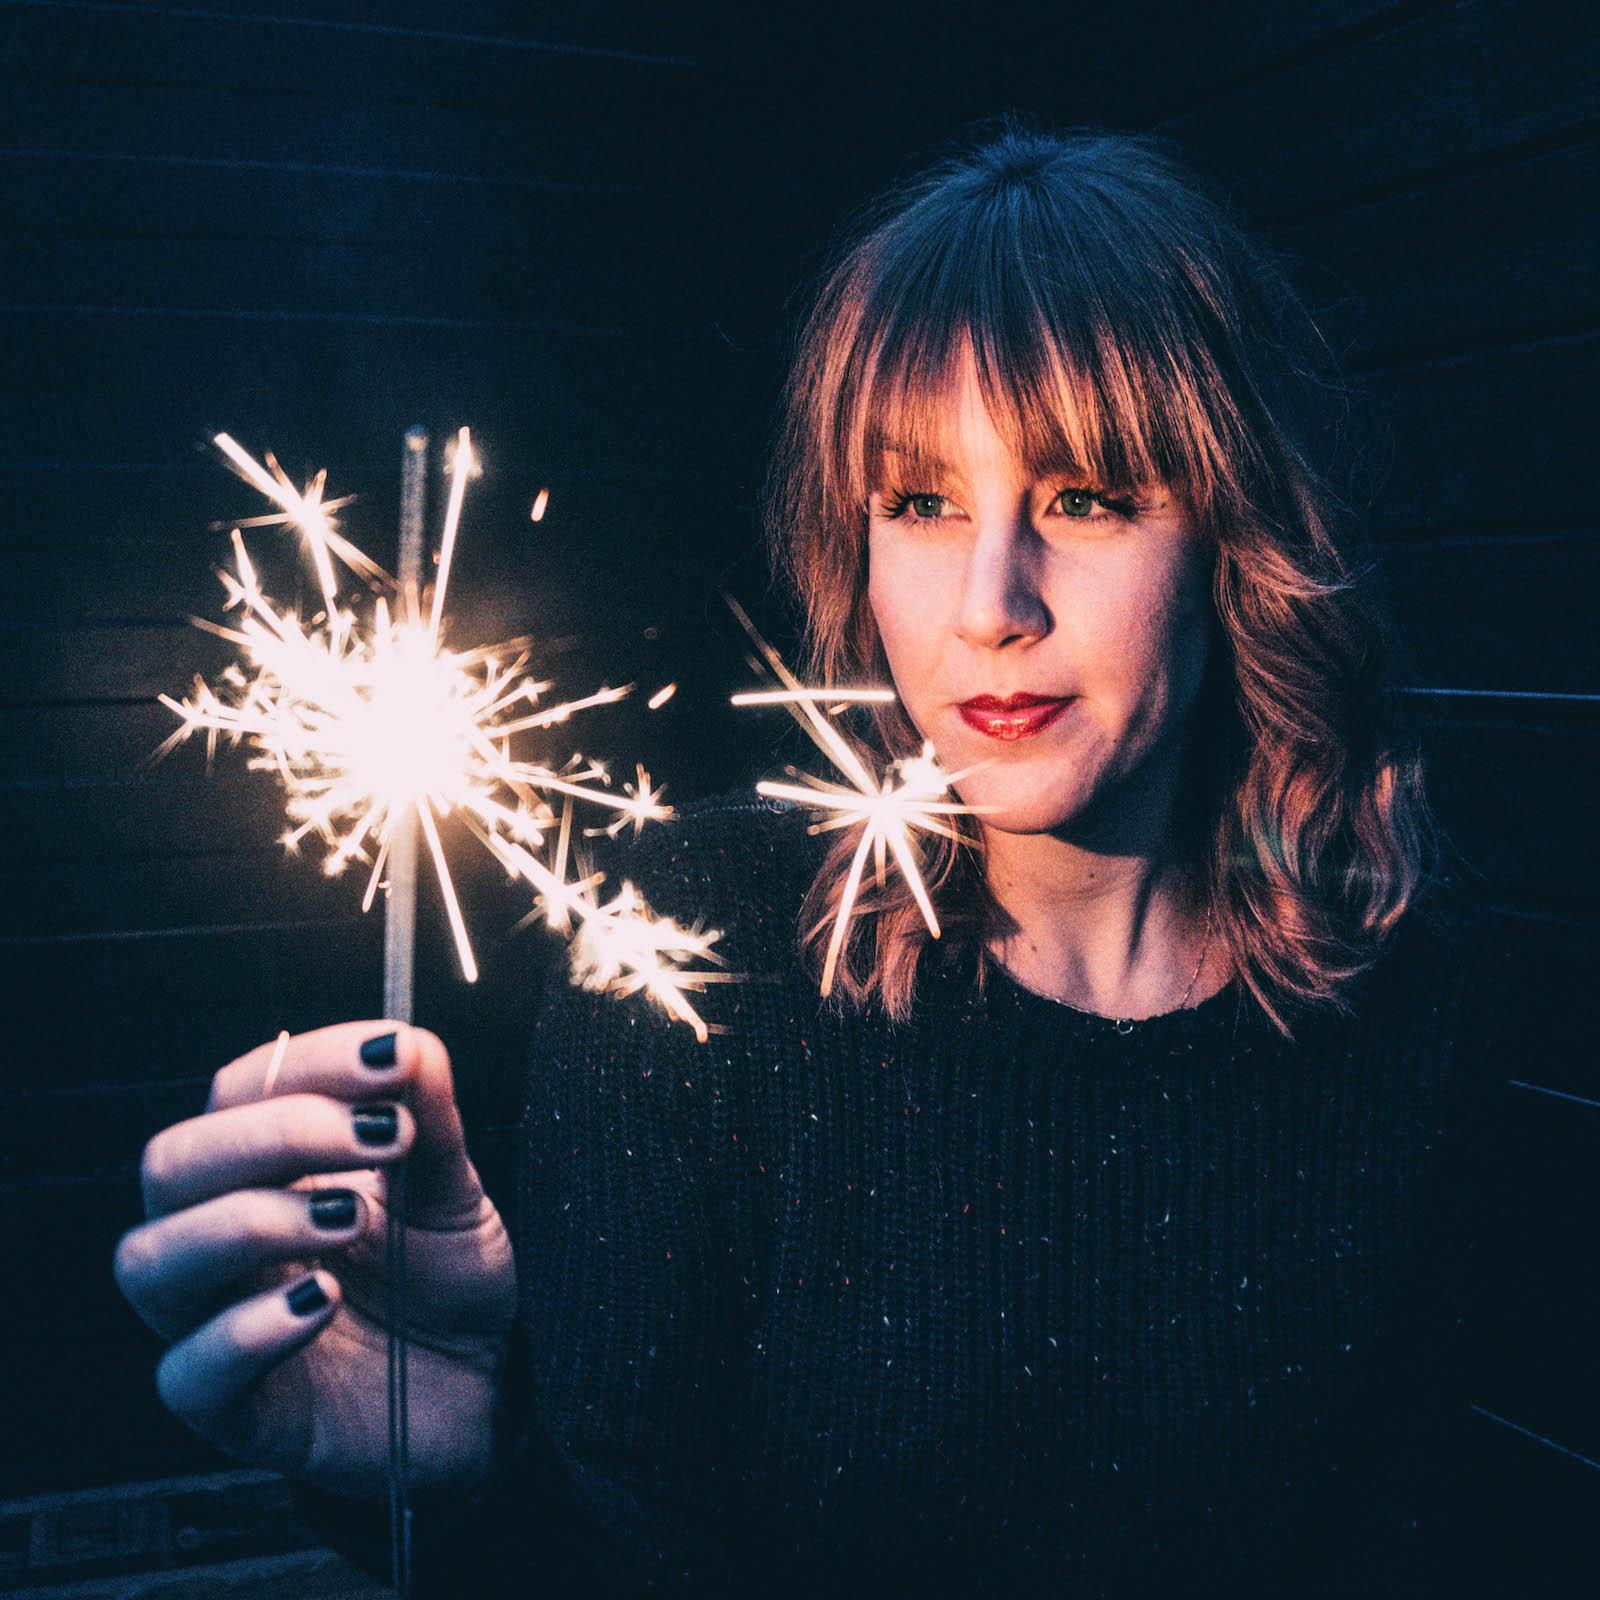 Julia Lassner globusliebe monthly diary Januar 2018